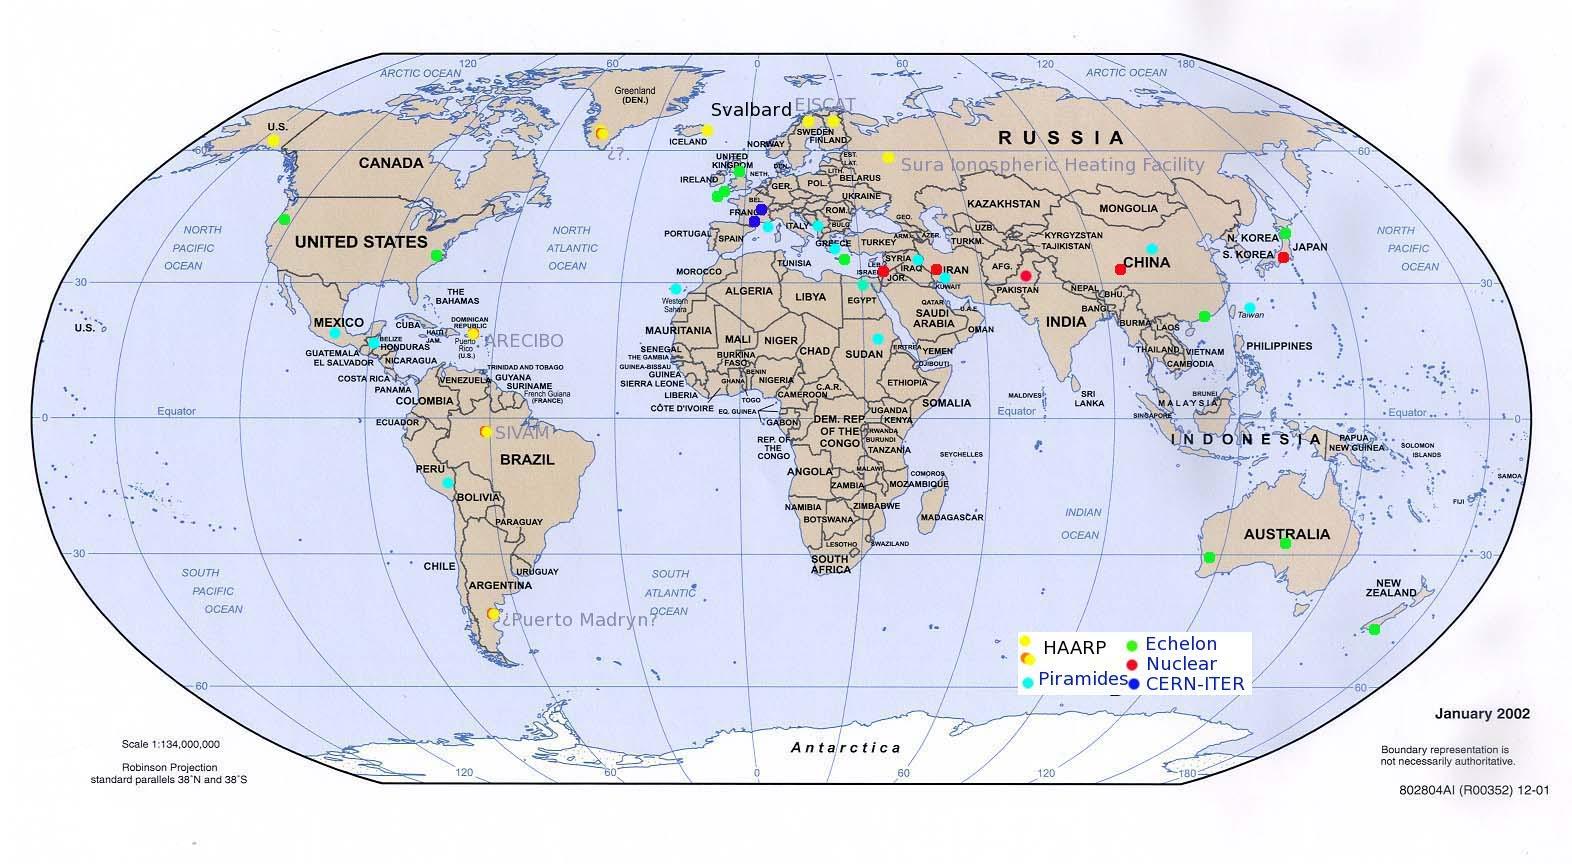 Varios Mapas del Mundo (con Paises) Gratis en Infografías.